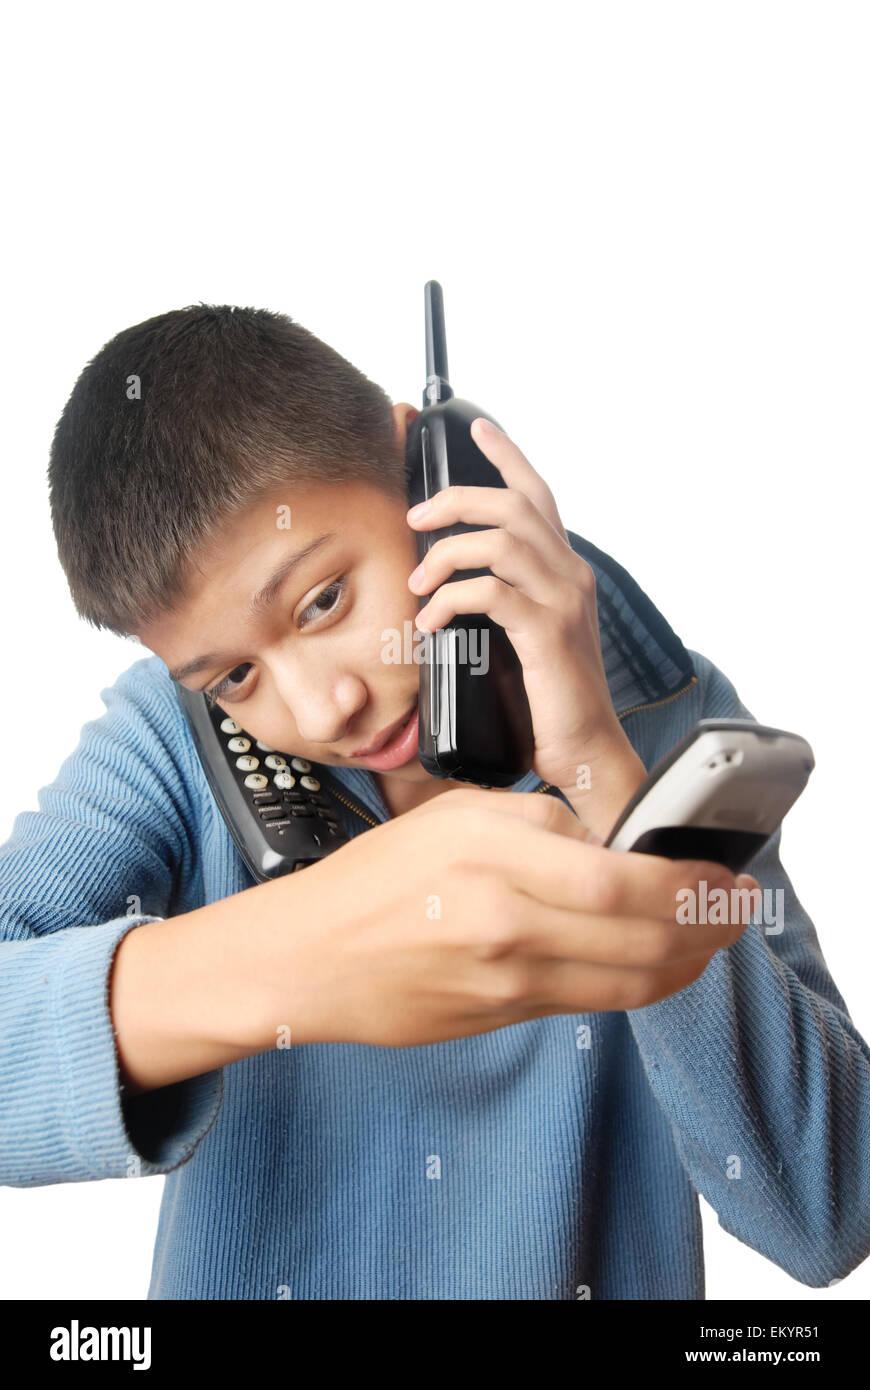 Urgent calling - Stock Image